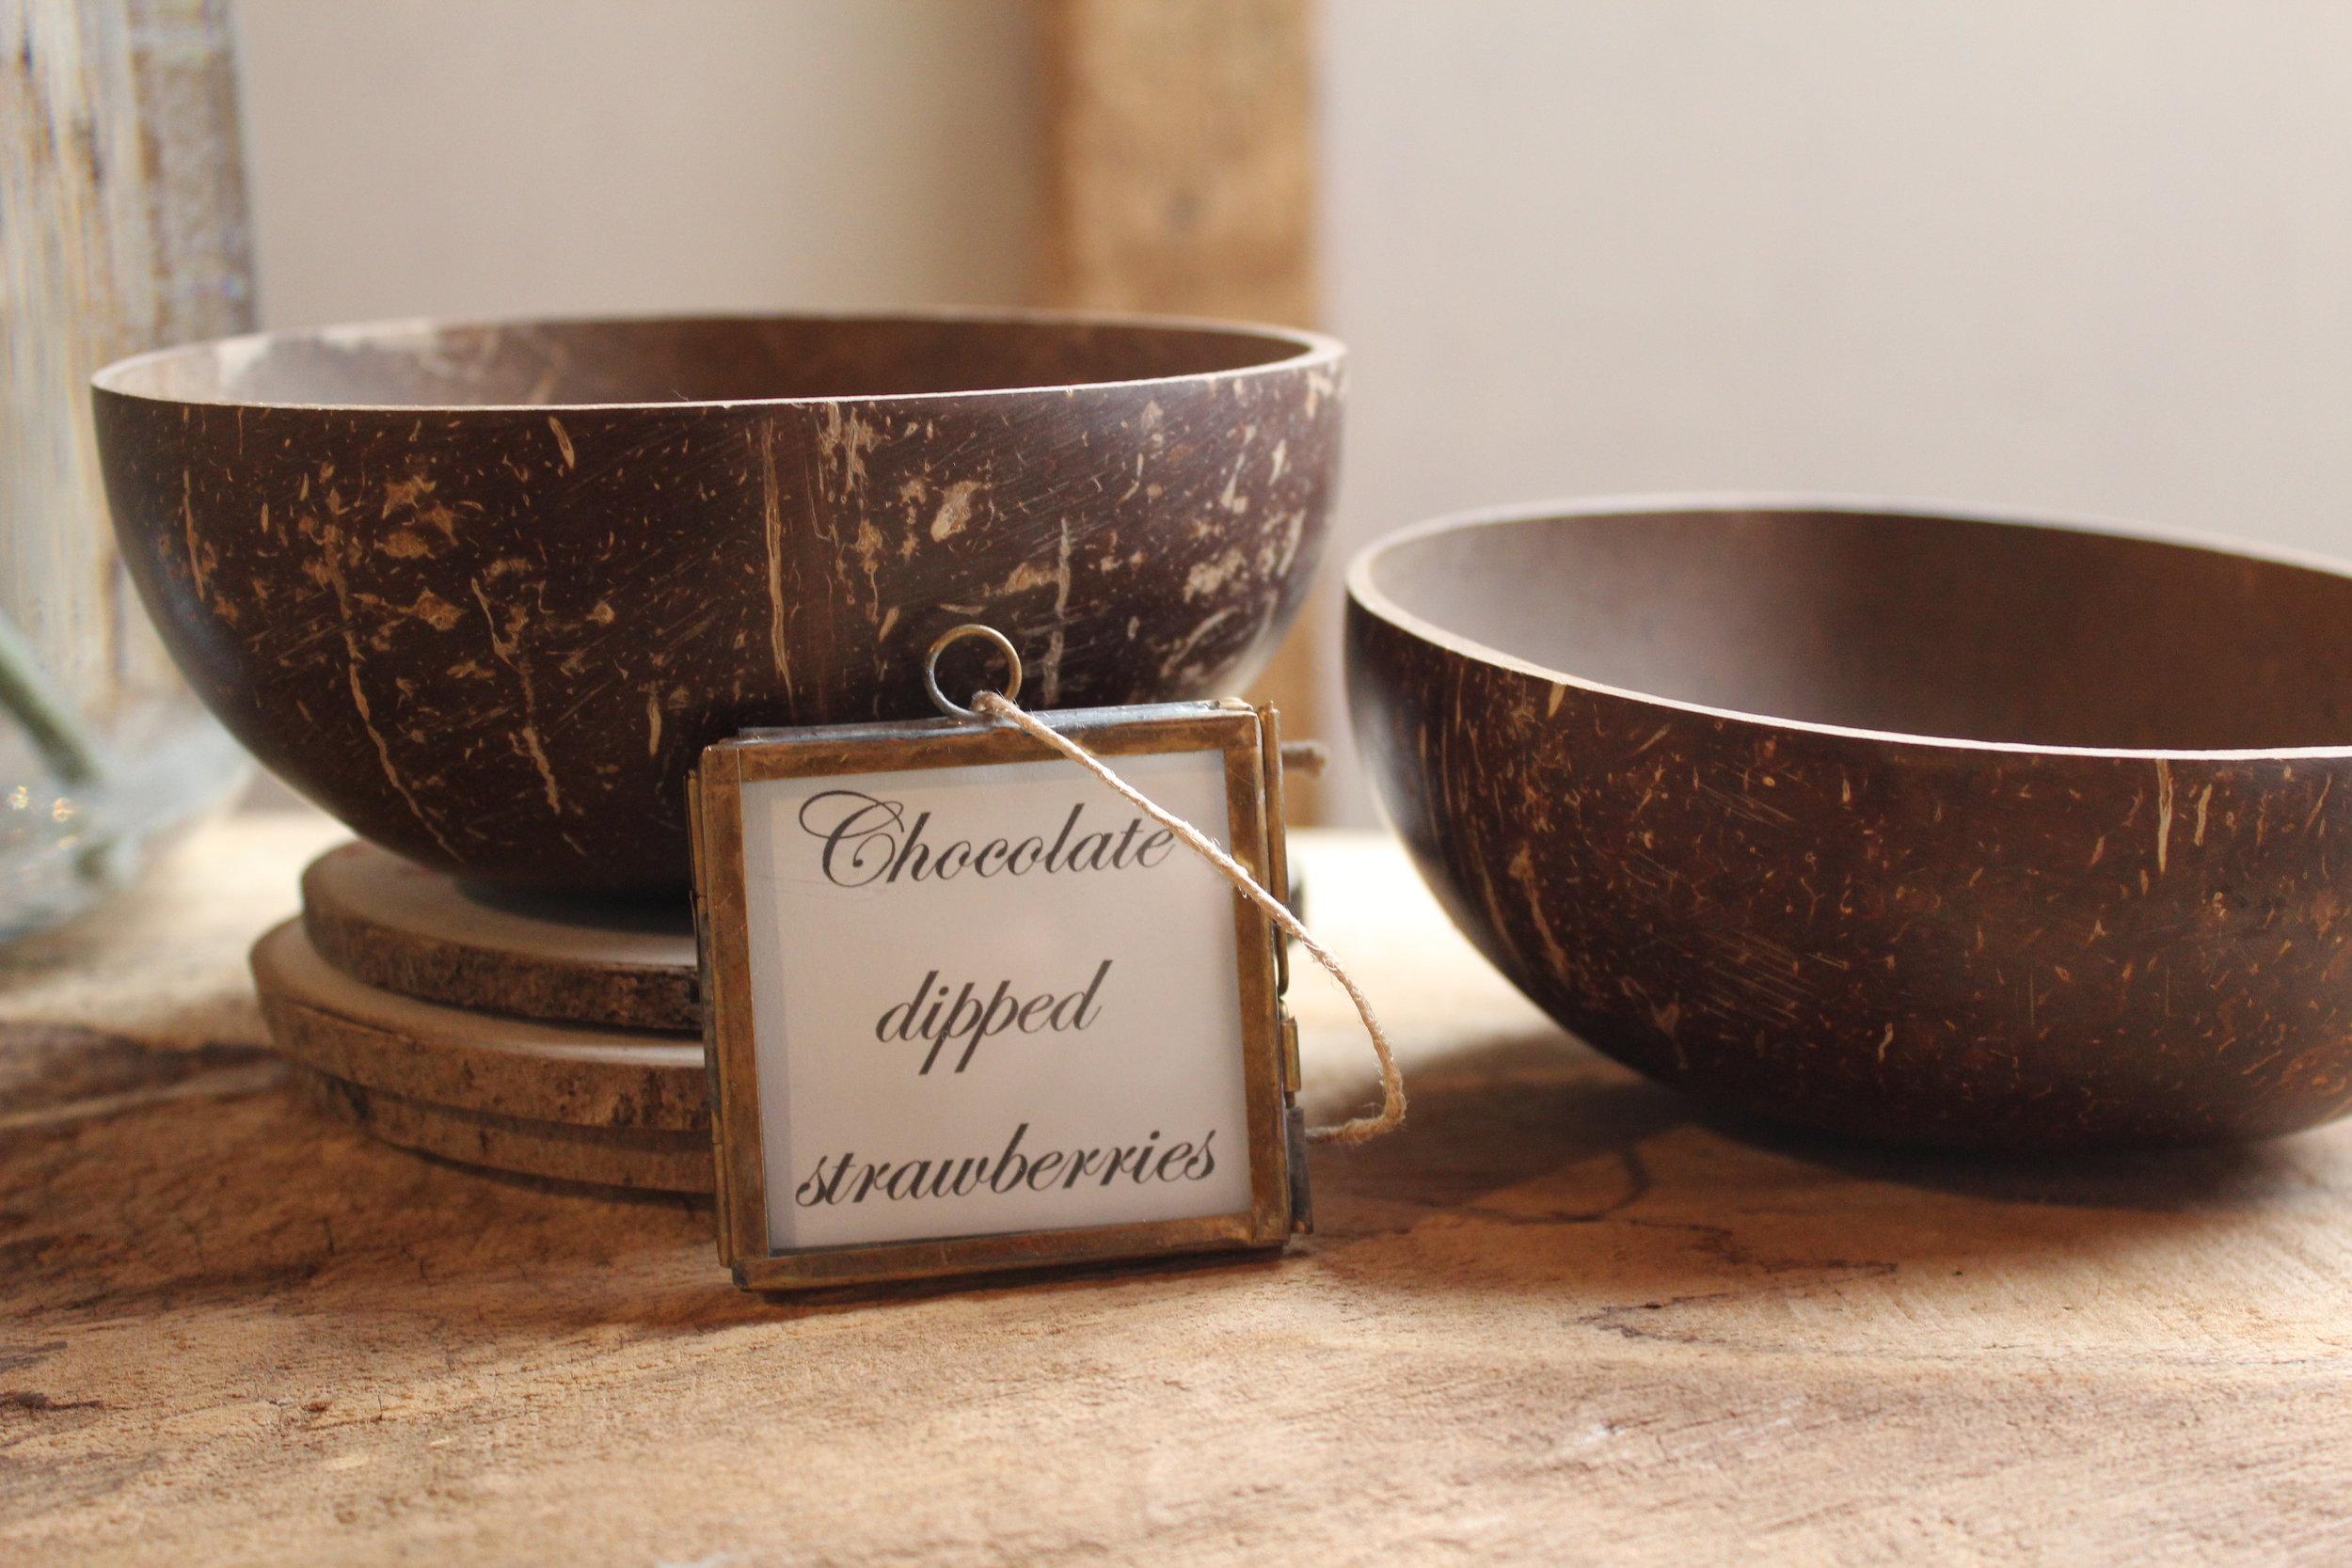 - Coconut Bowlsx8 £1.50 each